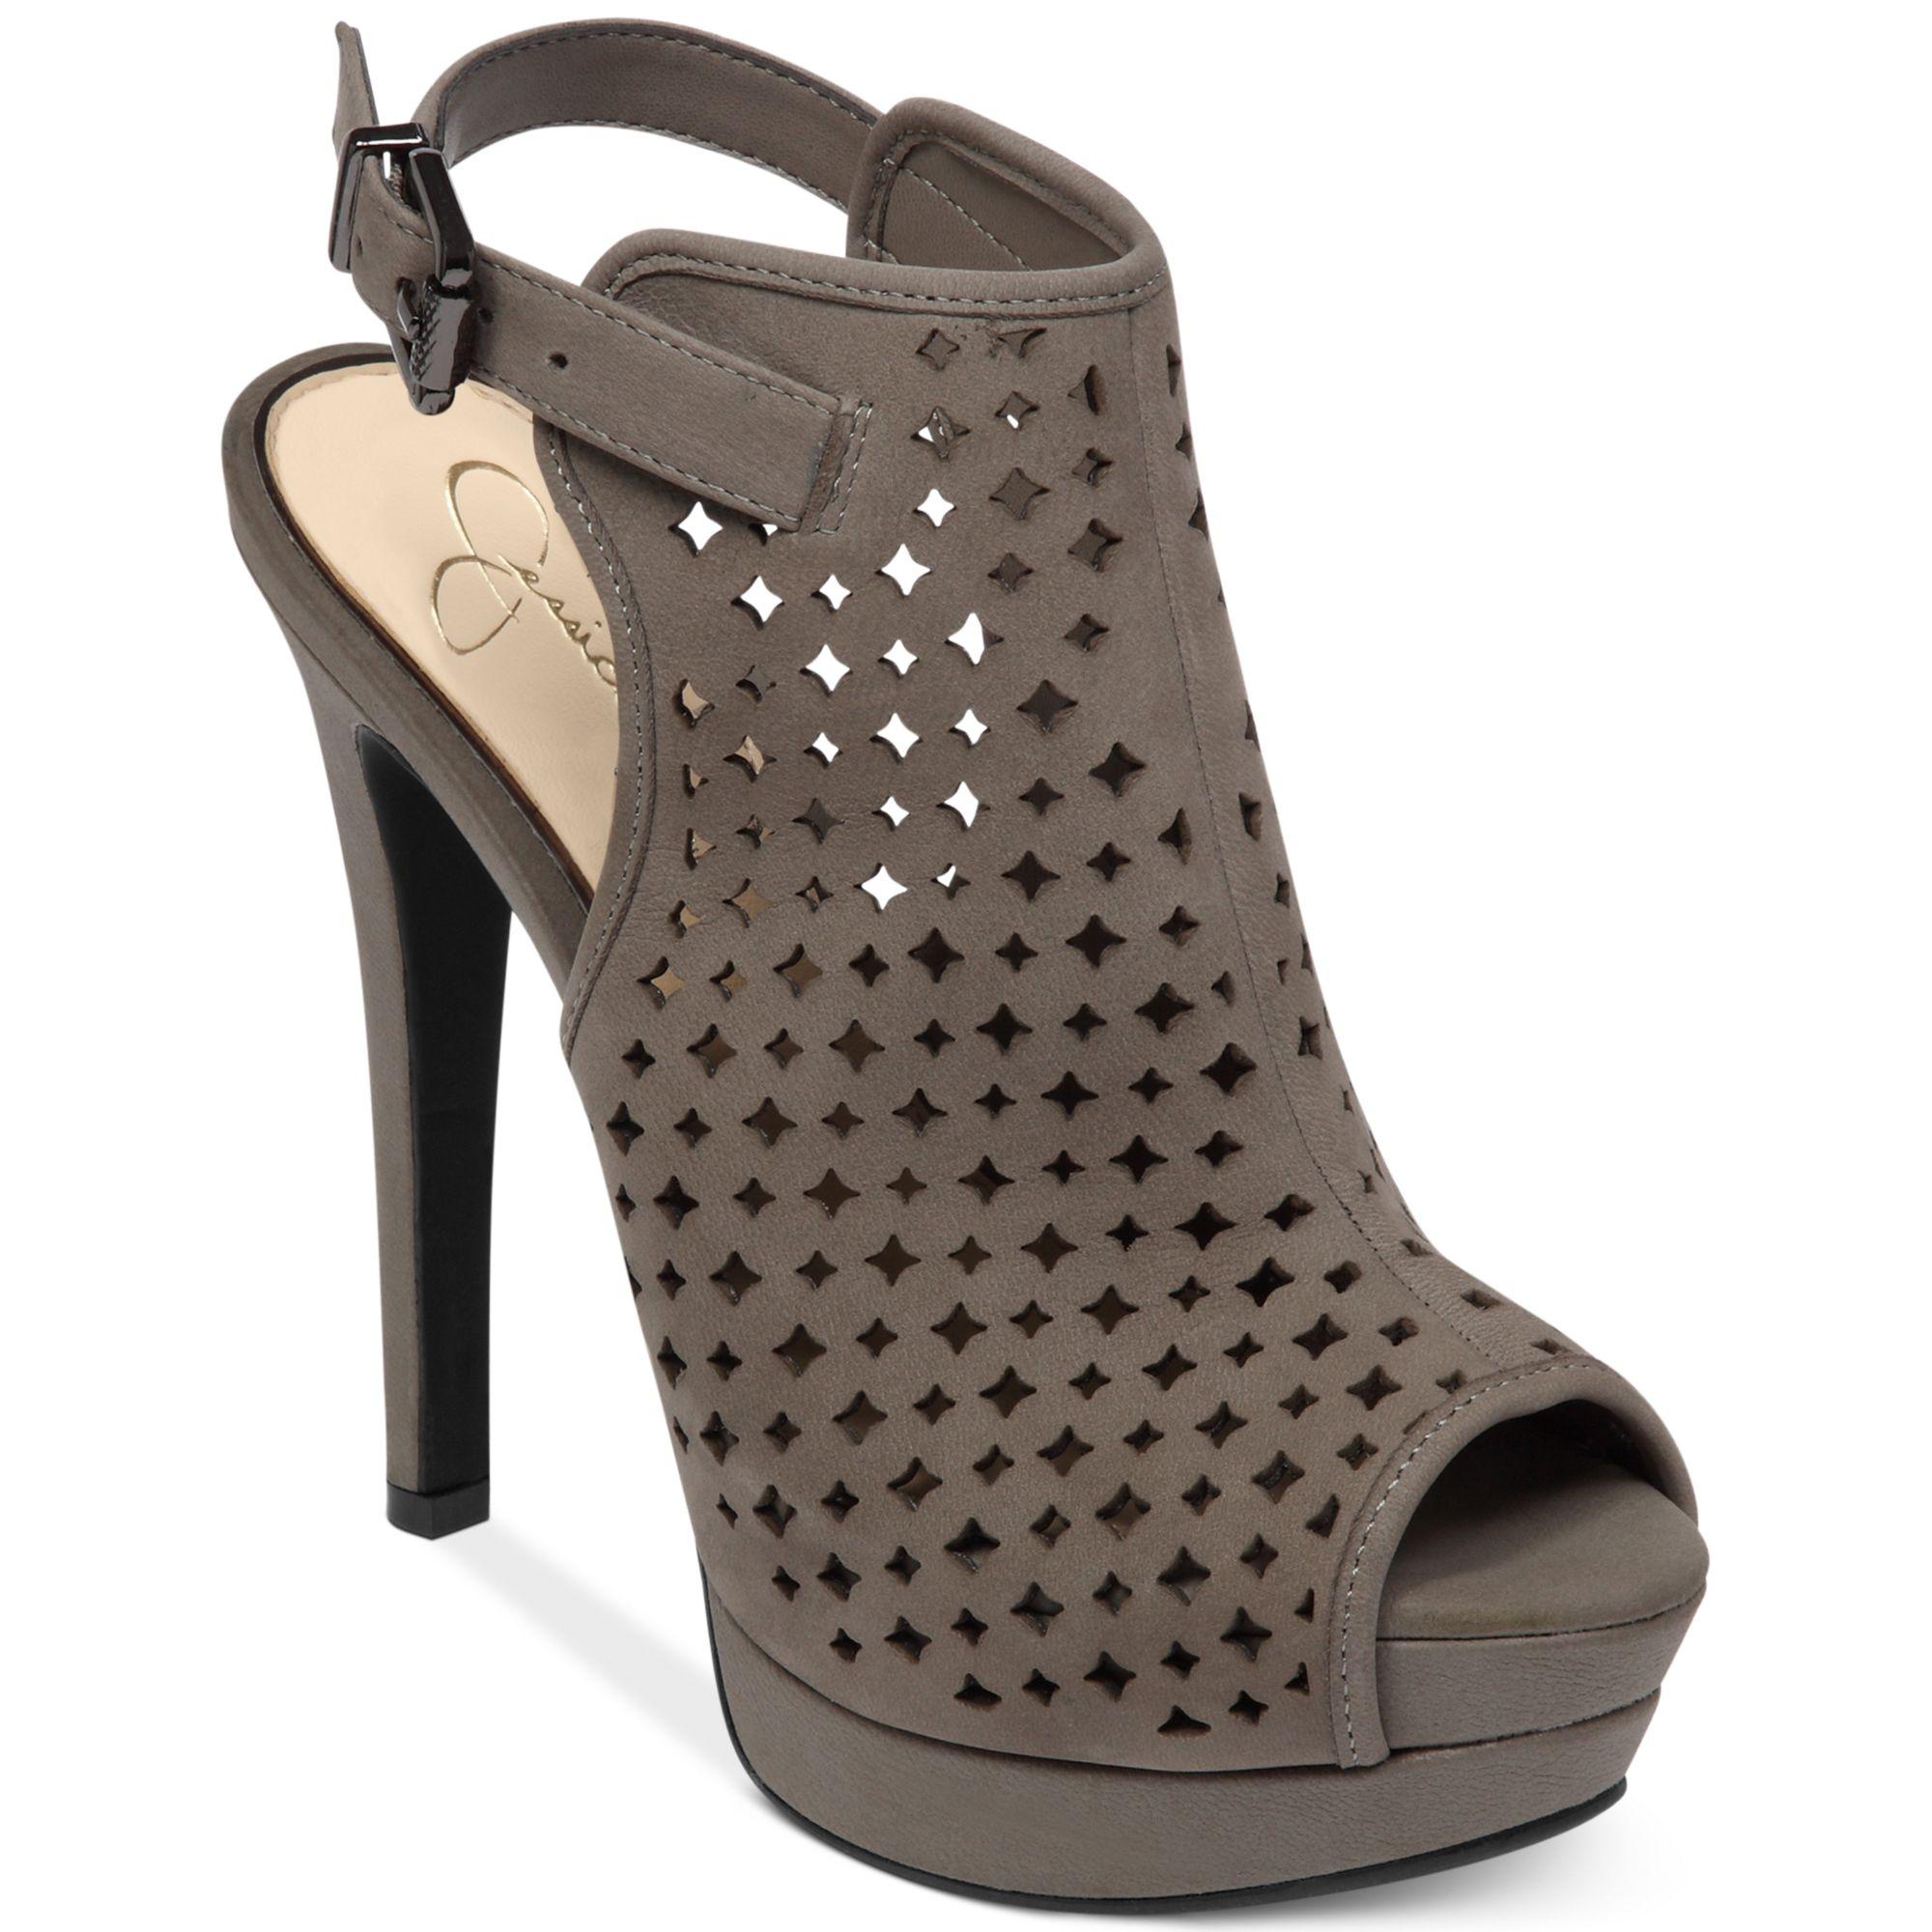 Jessica Simpson Tan Womens Shoes